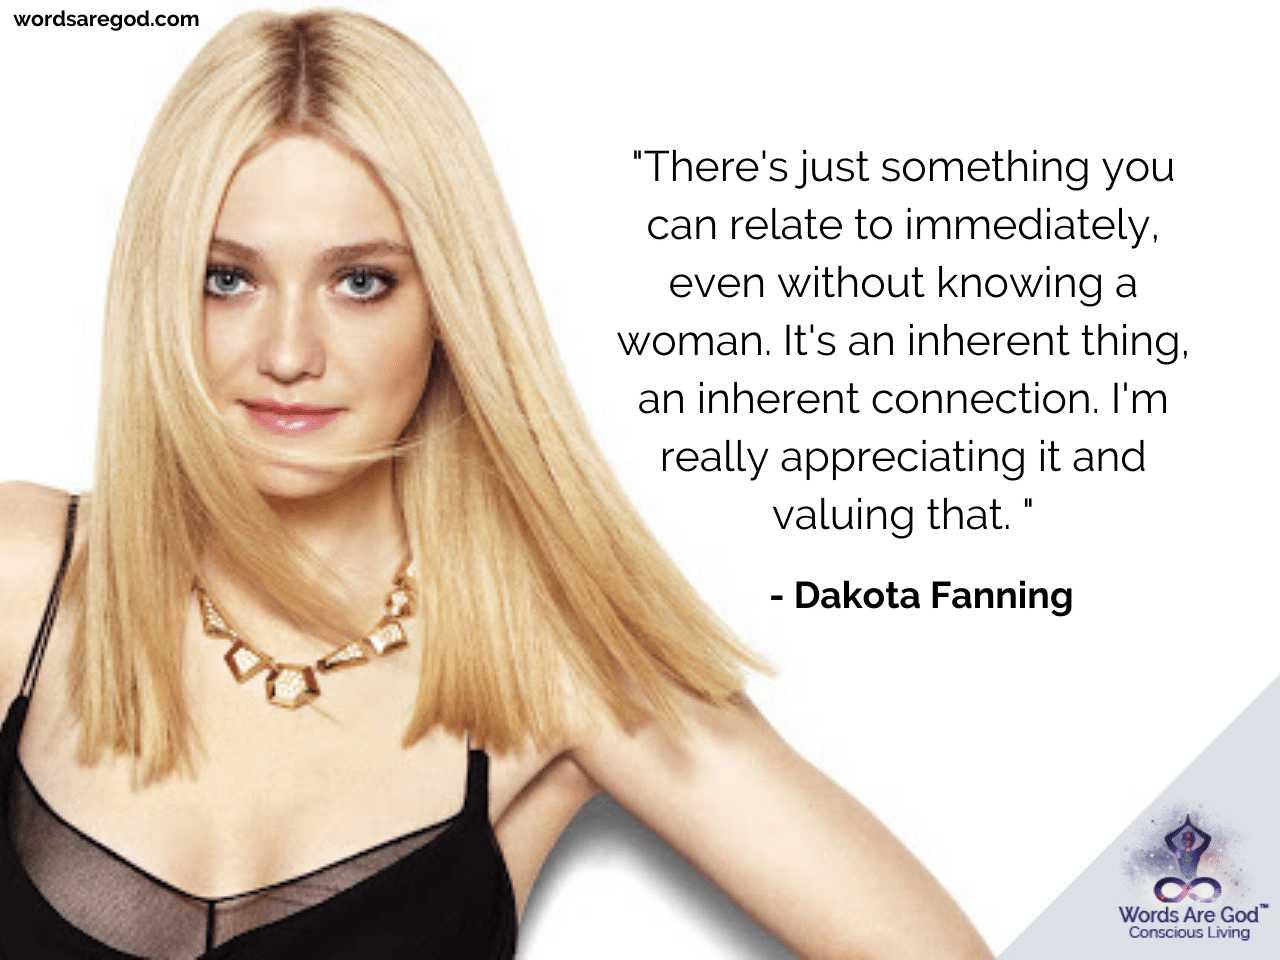 Dakota Fanning Life Quotes by Dakota Fanning